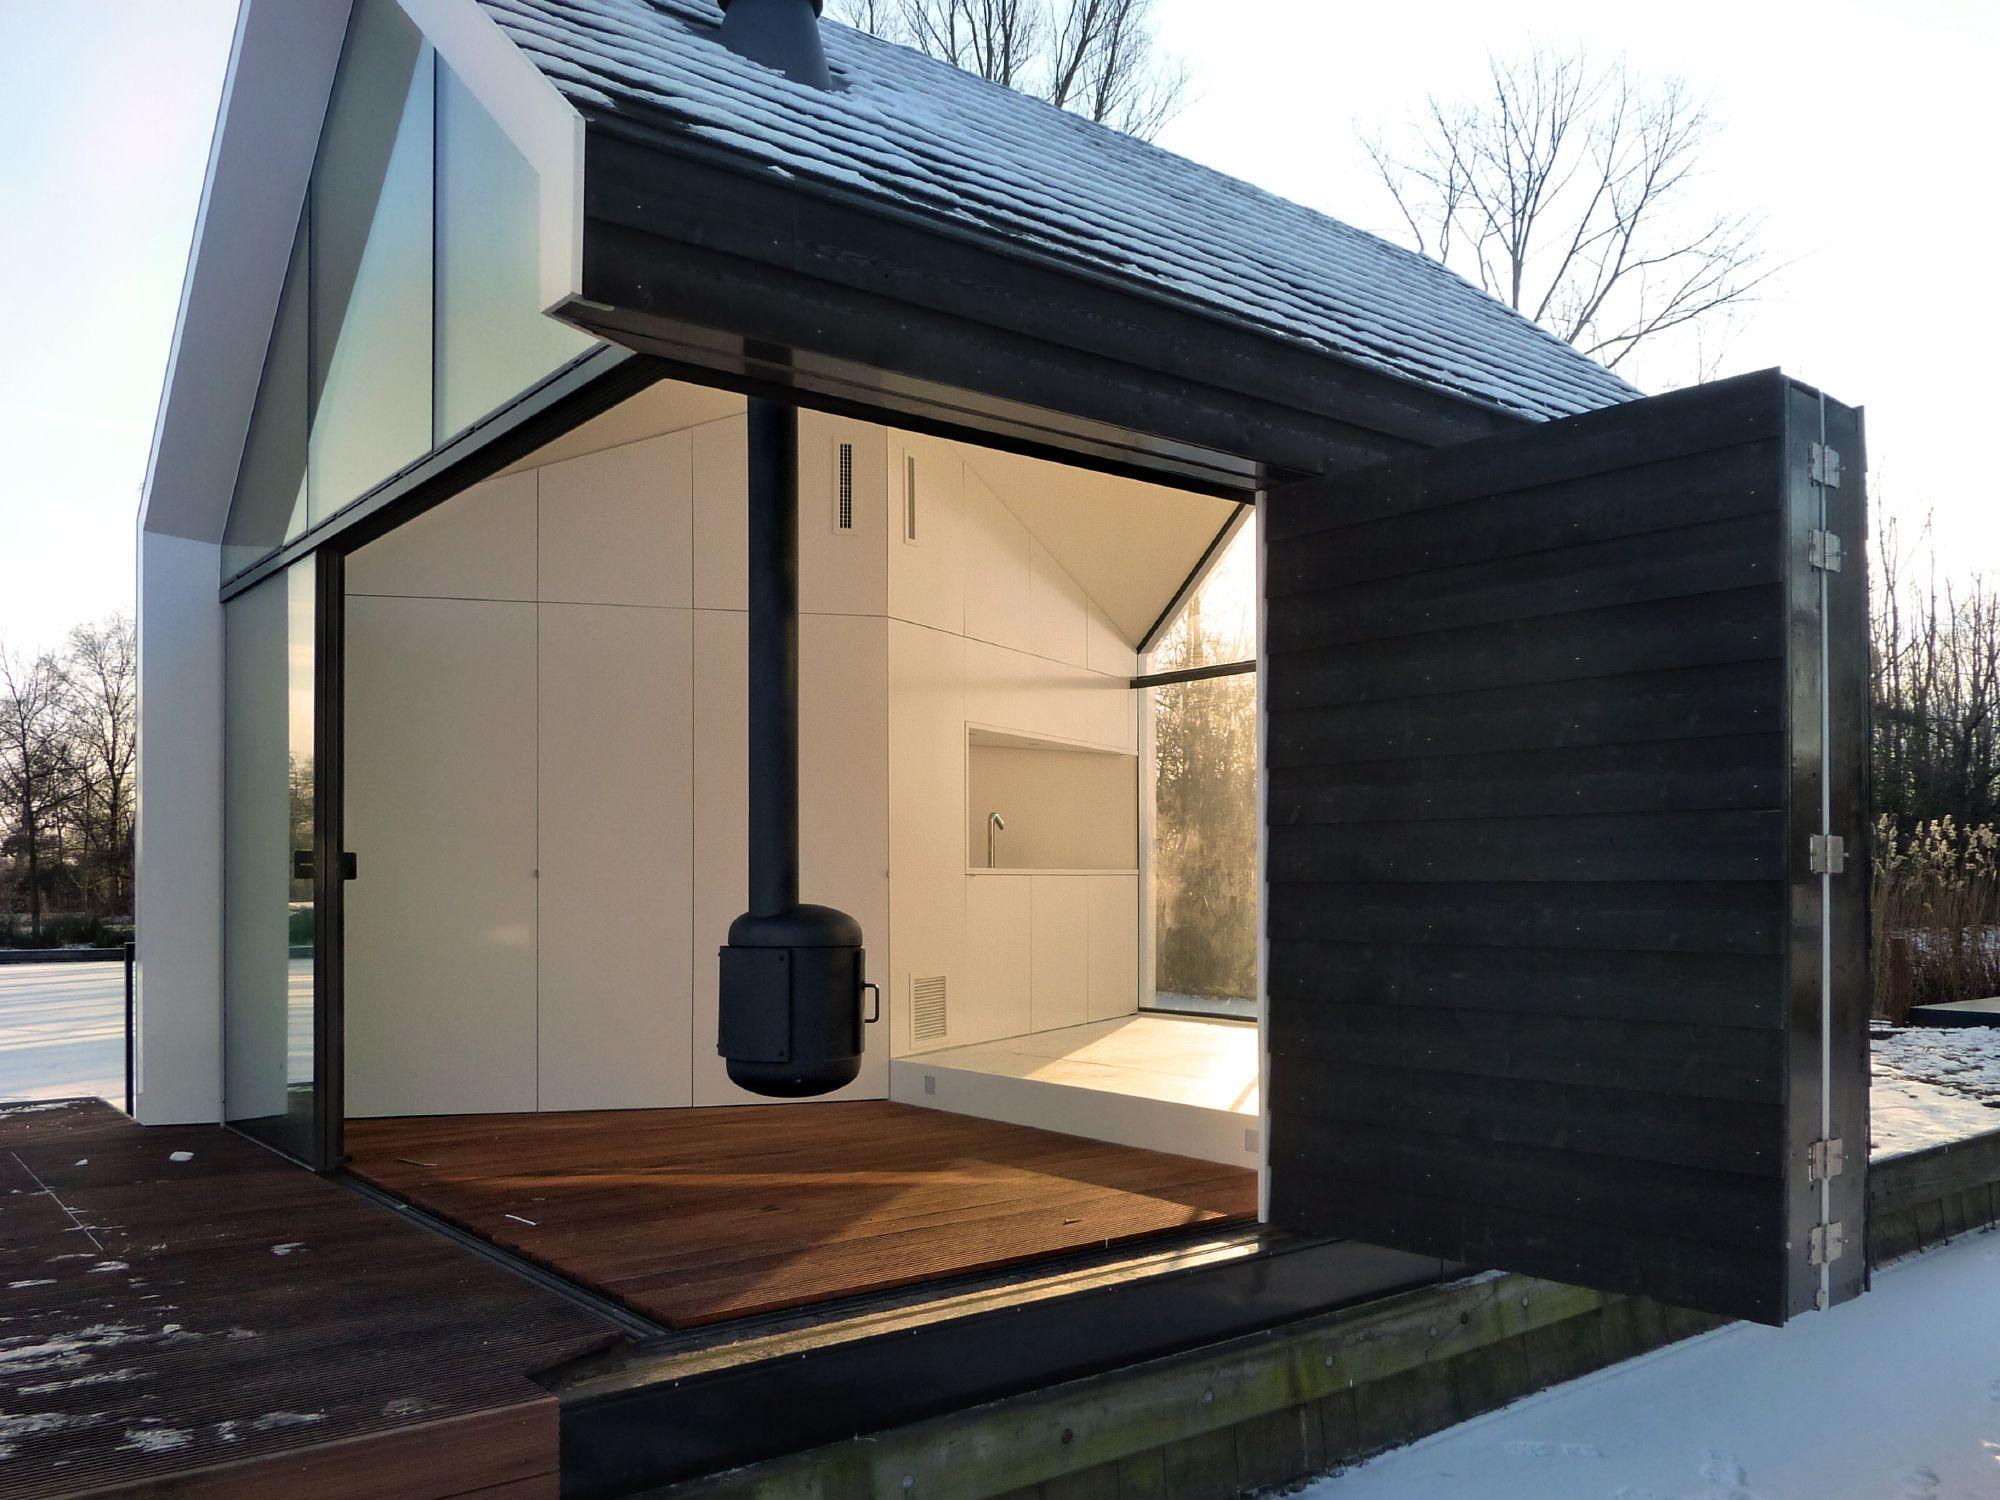 Wochenende am see minihaus in holland minihaus for Fertig minihaus